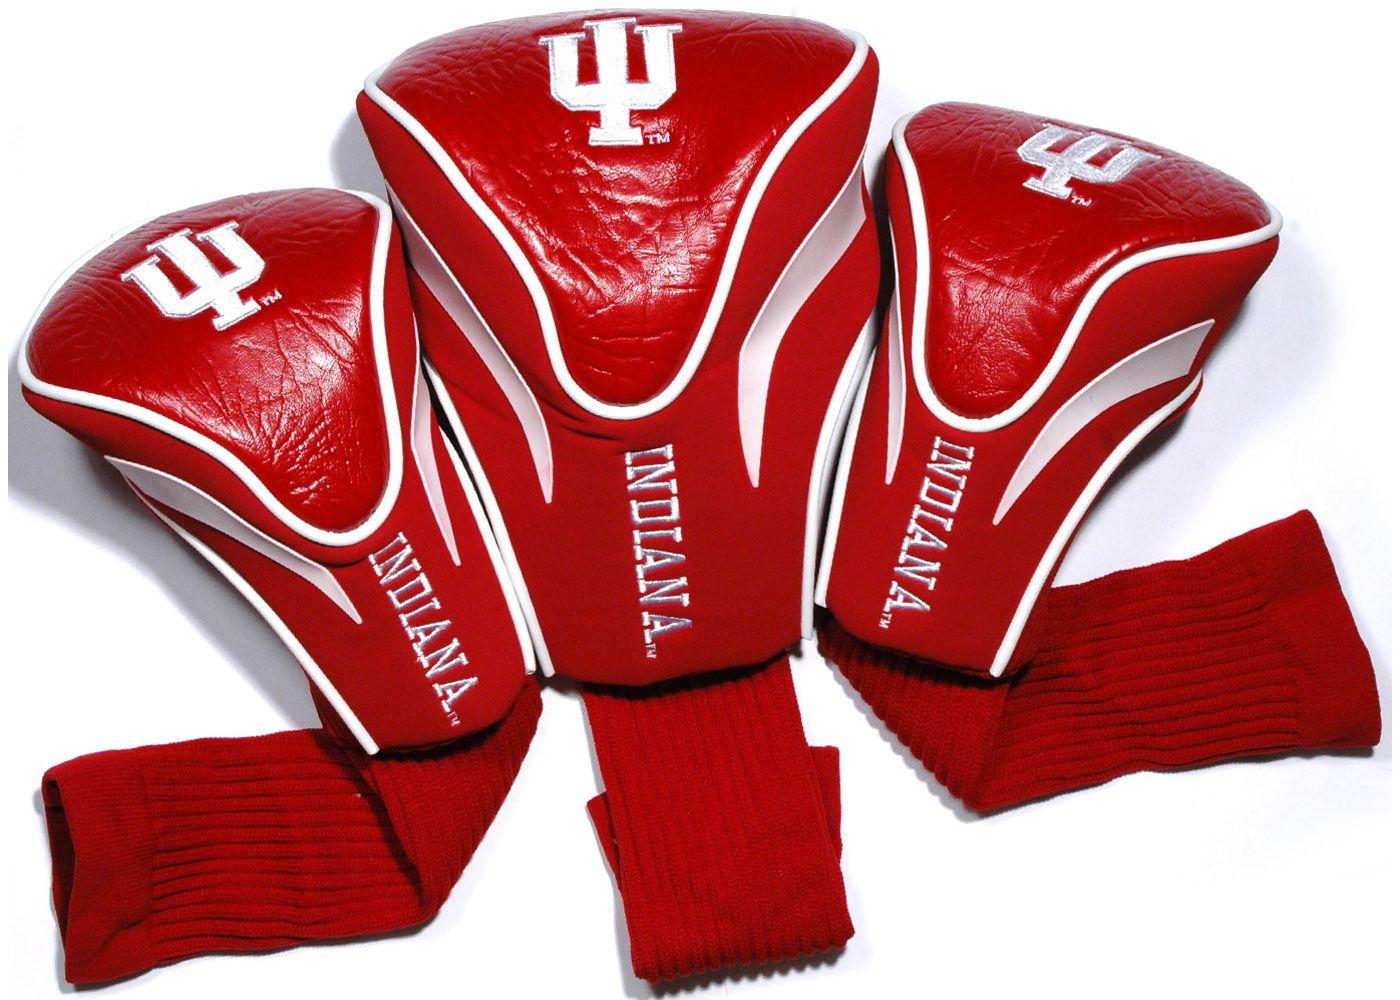 Team Golf Indiana Hoosiers Contour Sock Headcovers - 3 Pack